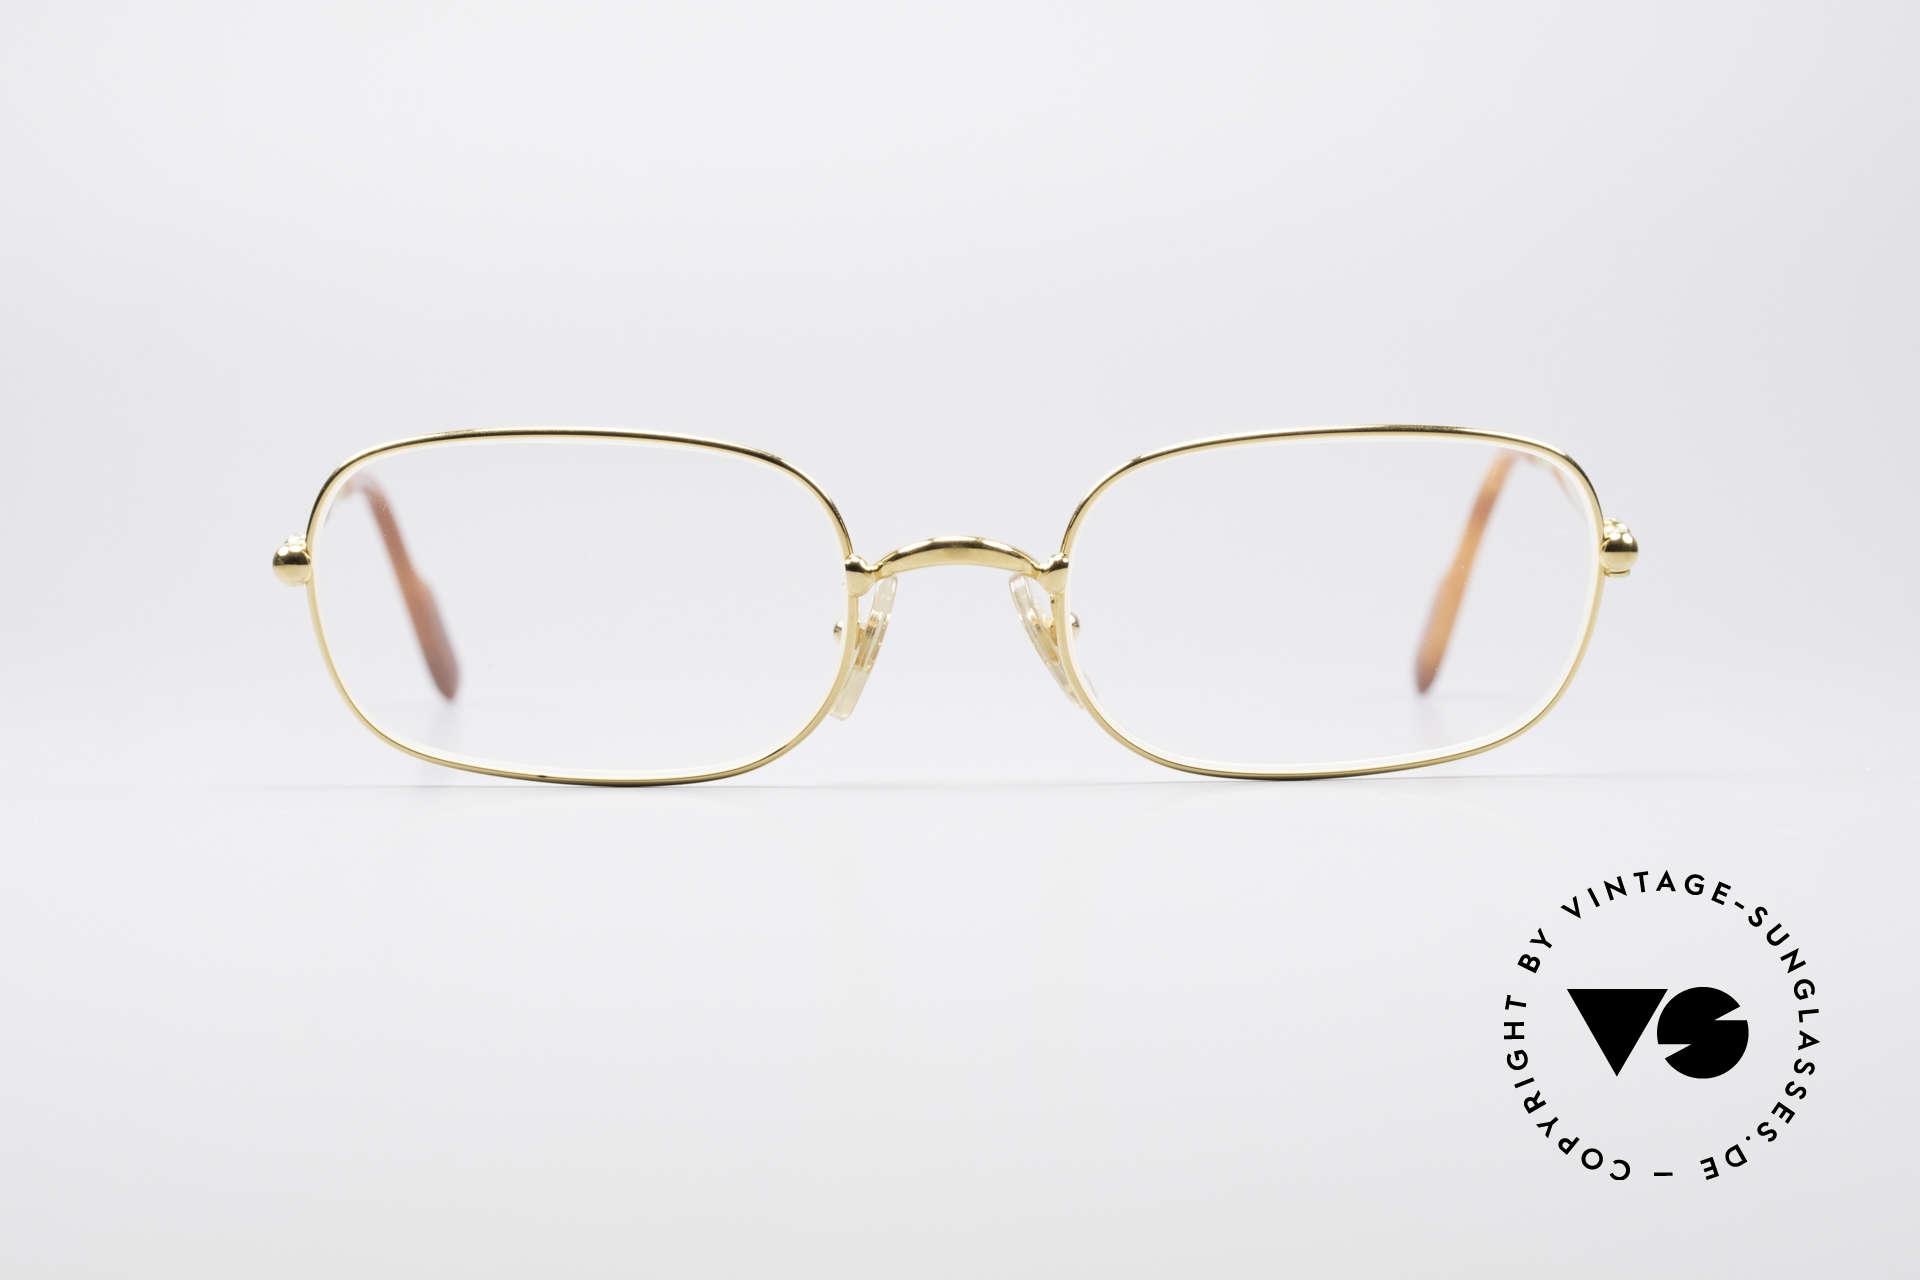 cdbe9ad5566 Glasses Cartier Deimios 90 s Luxury Eyeglasses